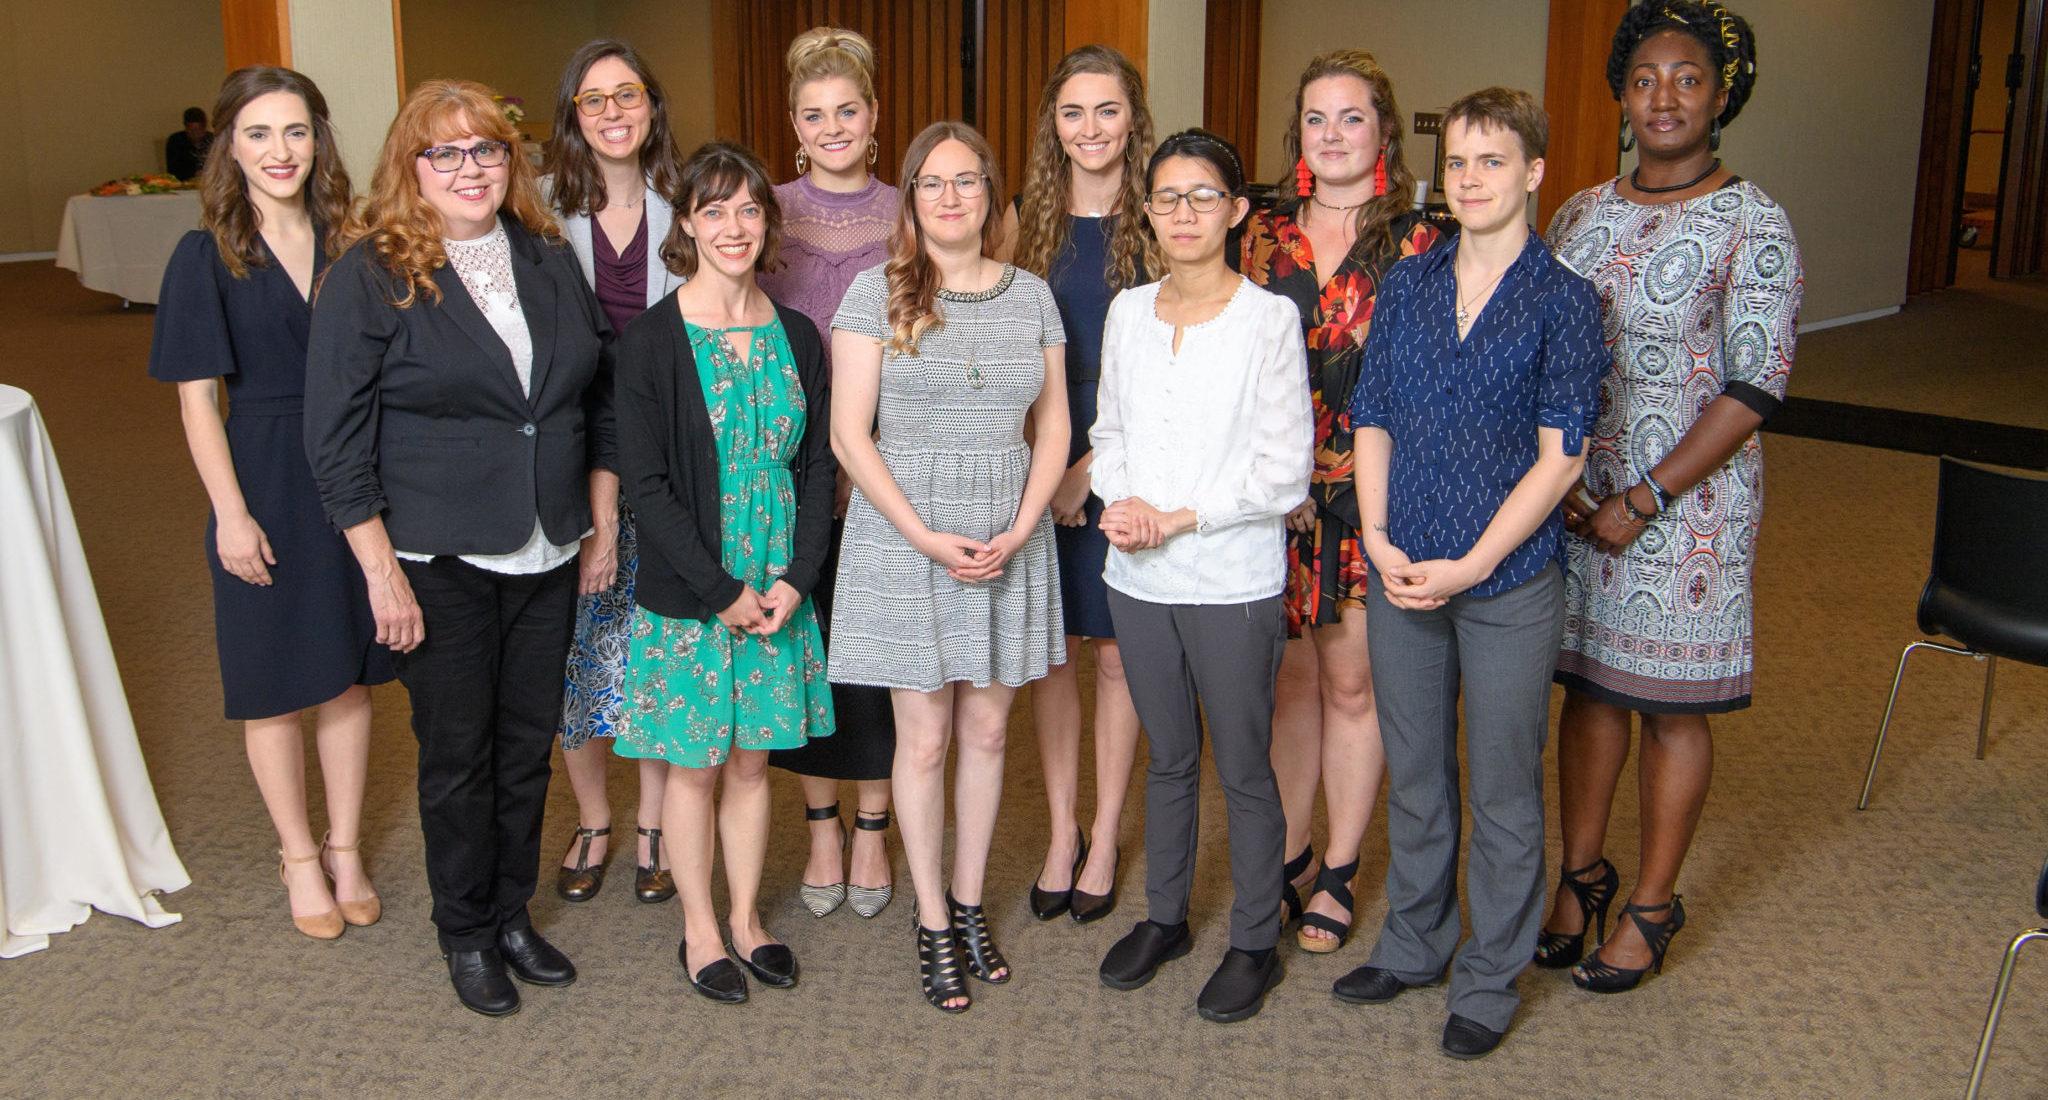 Tulsa Schweitzer Fellowship celebrates leadership and community service